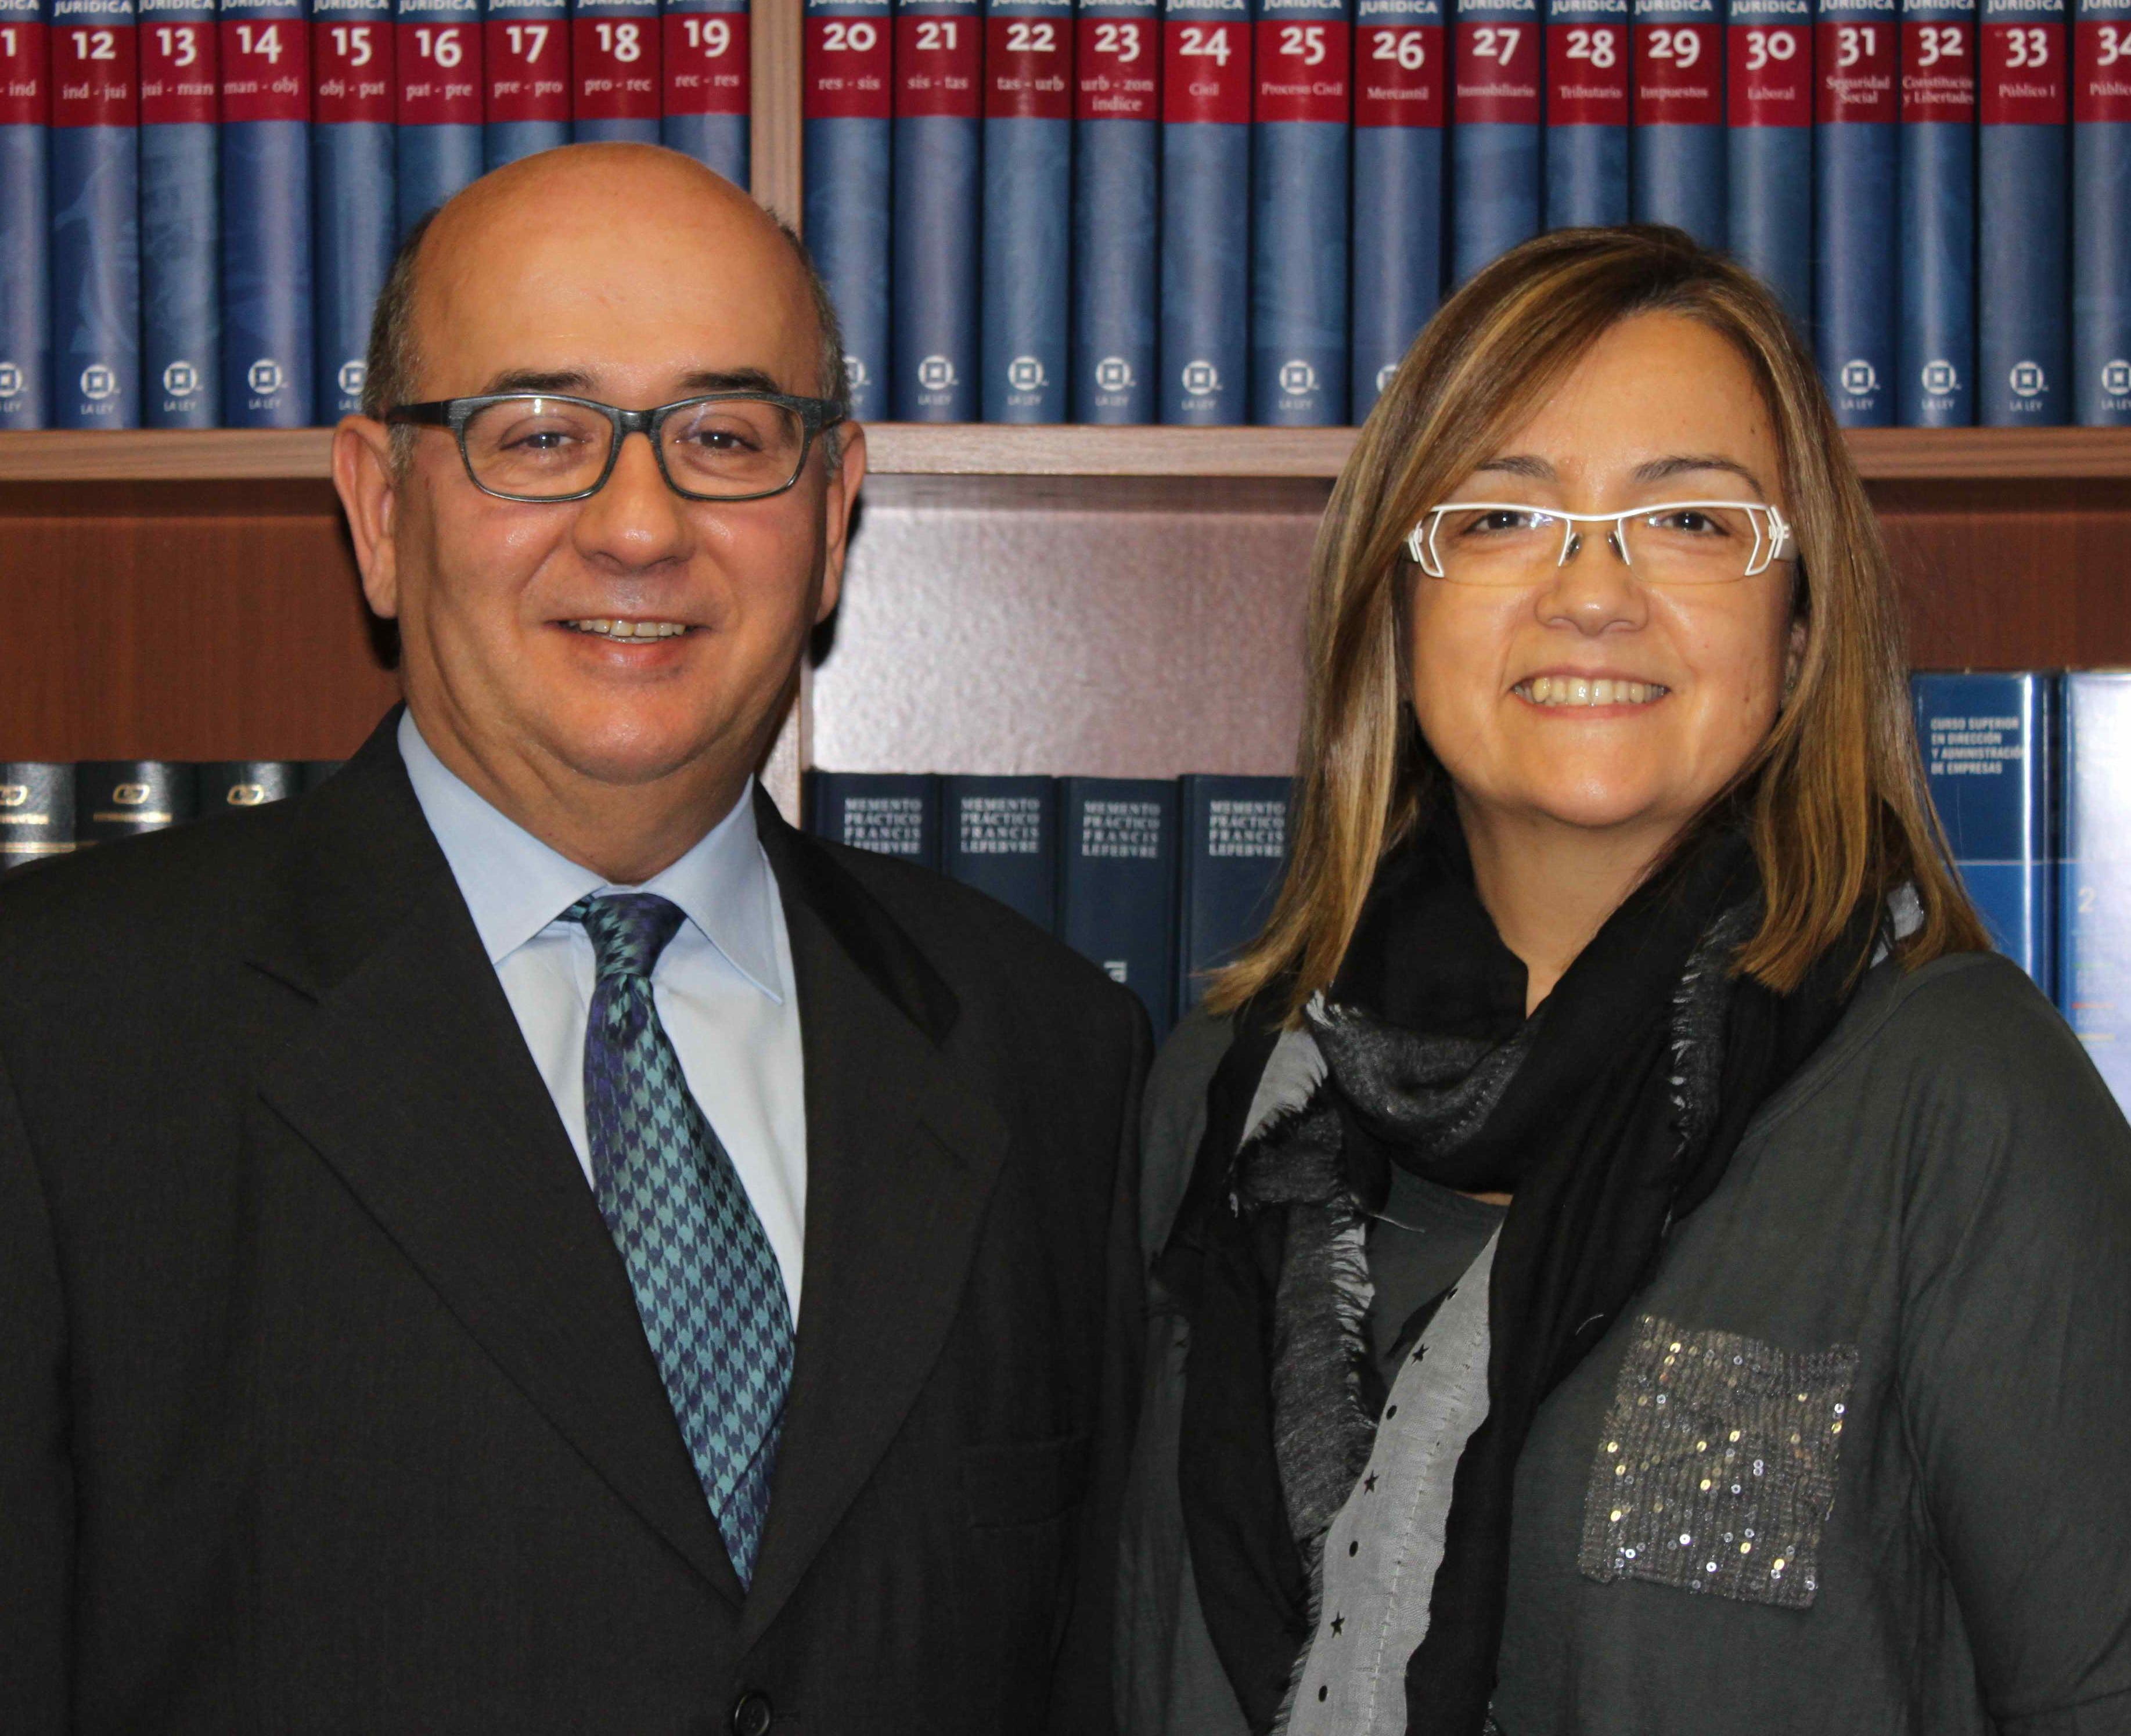 Sr. Agustí Alier i Jané i Sra. Antònia Beltran i Muñoz